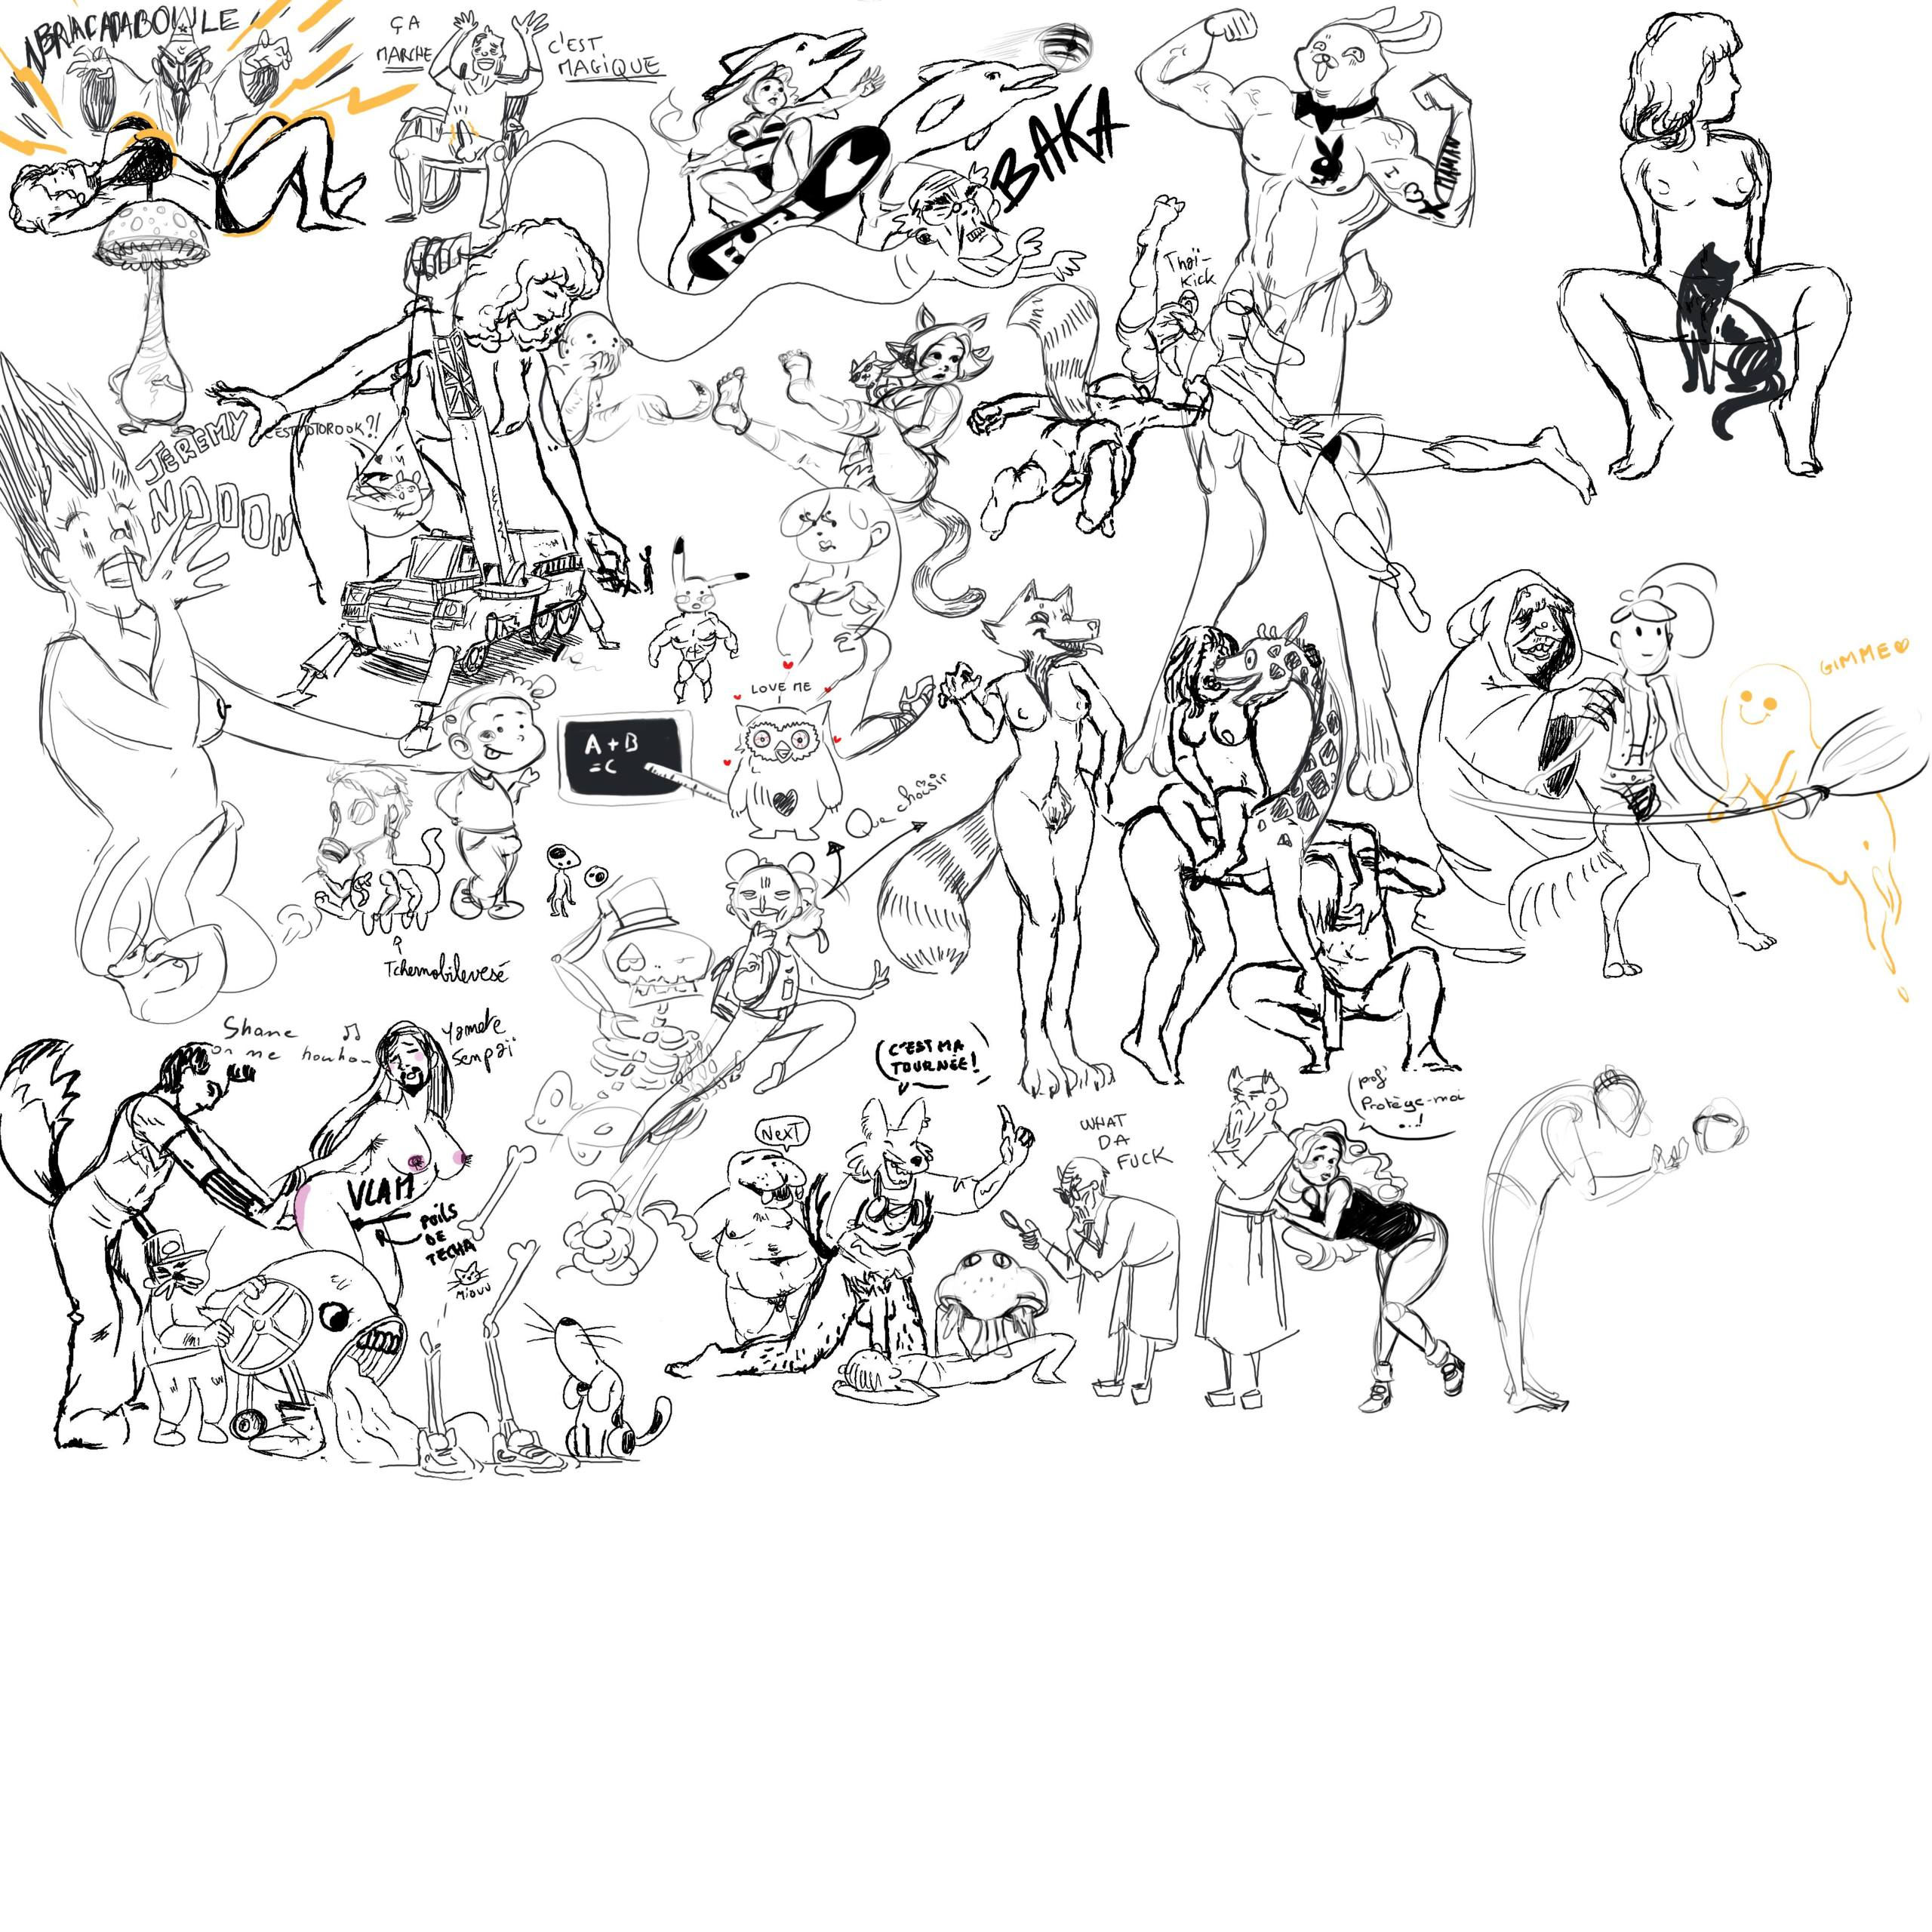 [nsfw]Drawpile : logiciel de dessin partagé Drawpi11